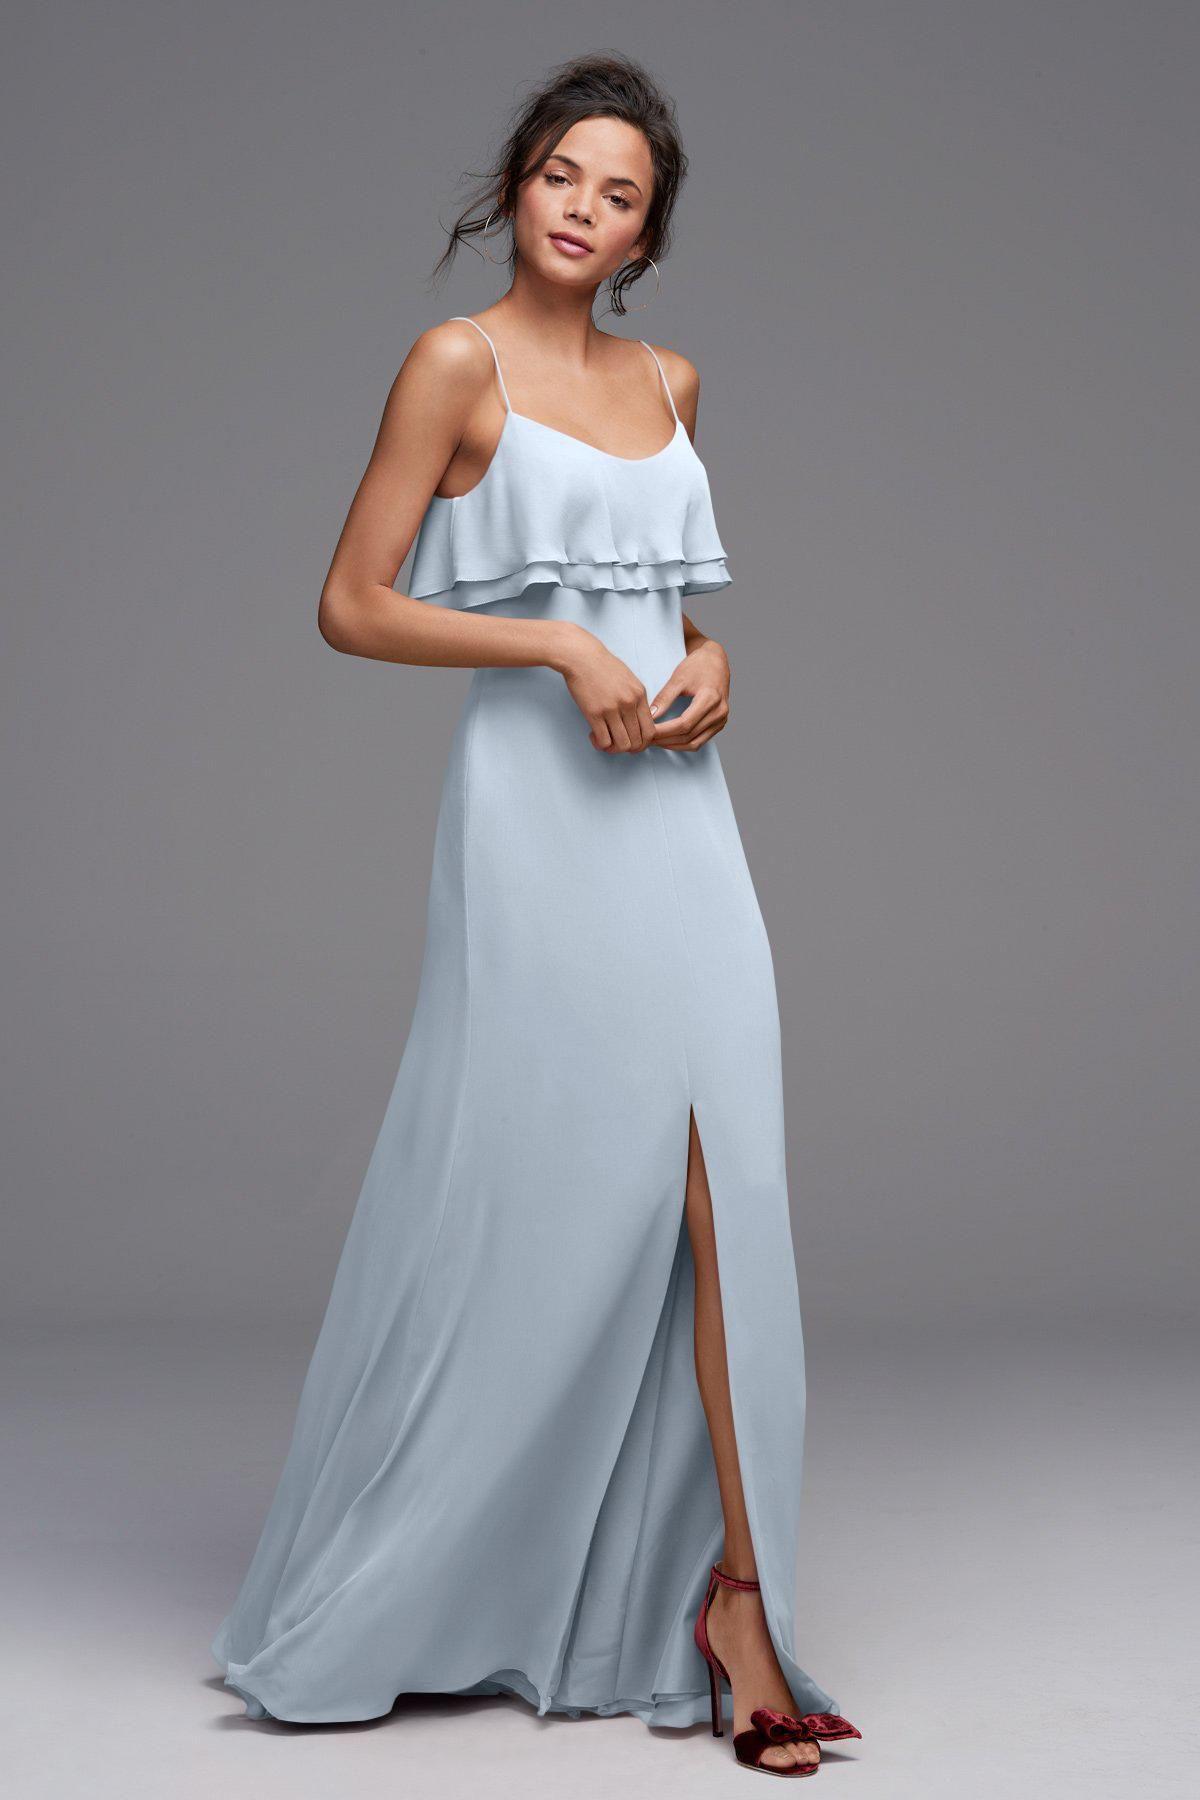 Jasper 4501 | Watters Bridesmaids | Watters | Maid of honor | Pinterest